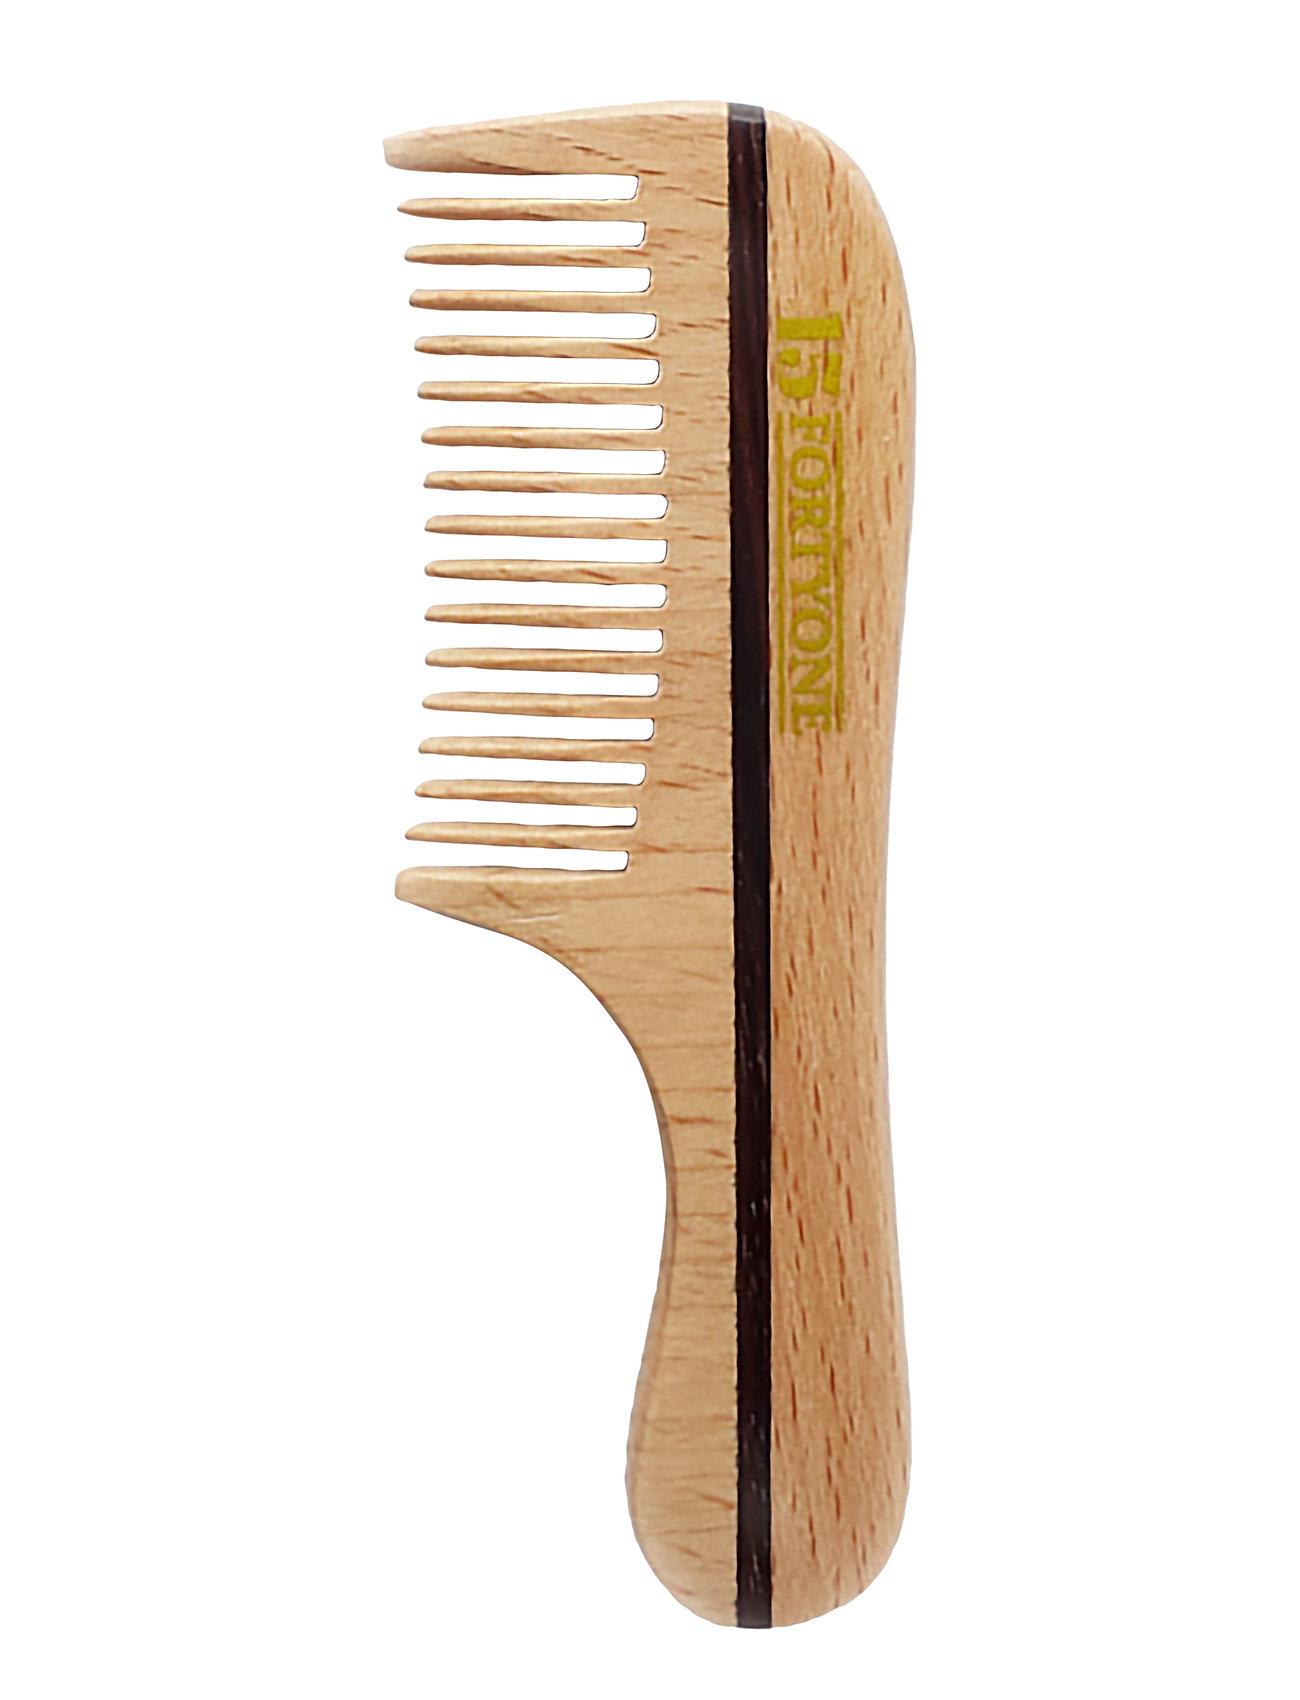 Image of Wooden Moustache/Beard Comb Natural Beechwood Beauty MEN Shaving Products Beard & Mustache 1541 Of London (3408639531)